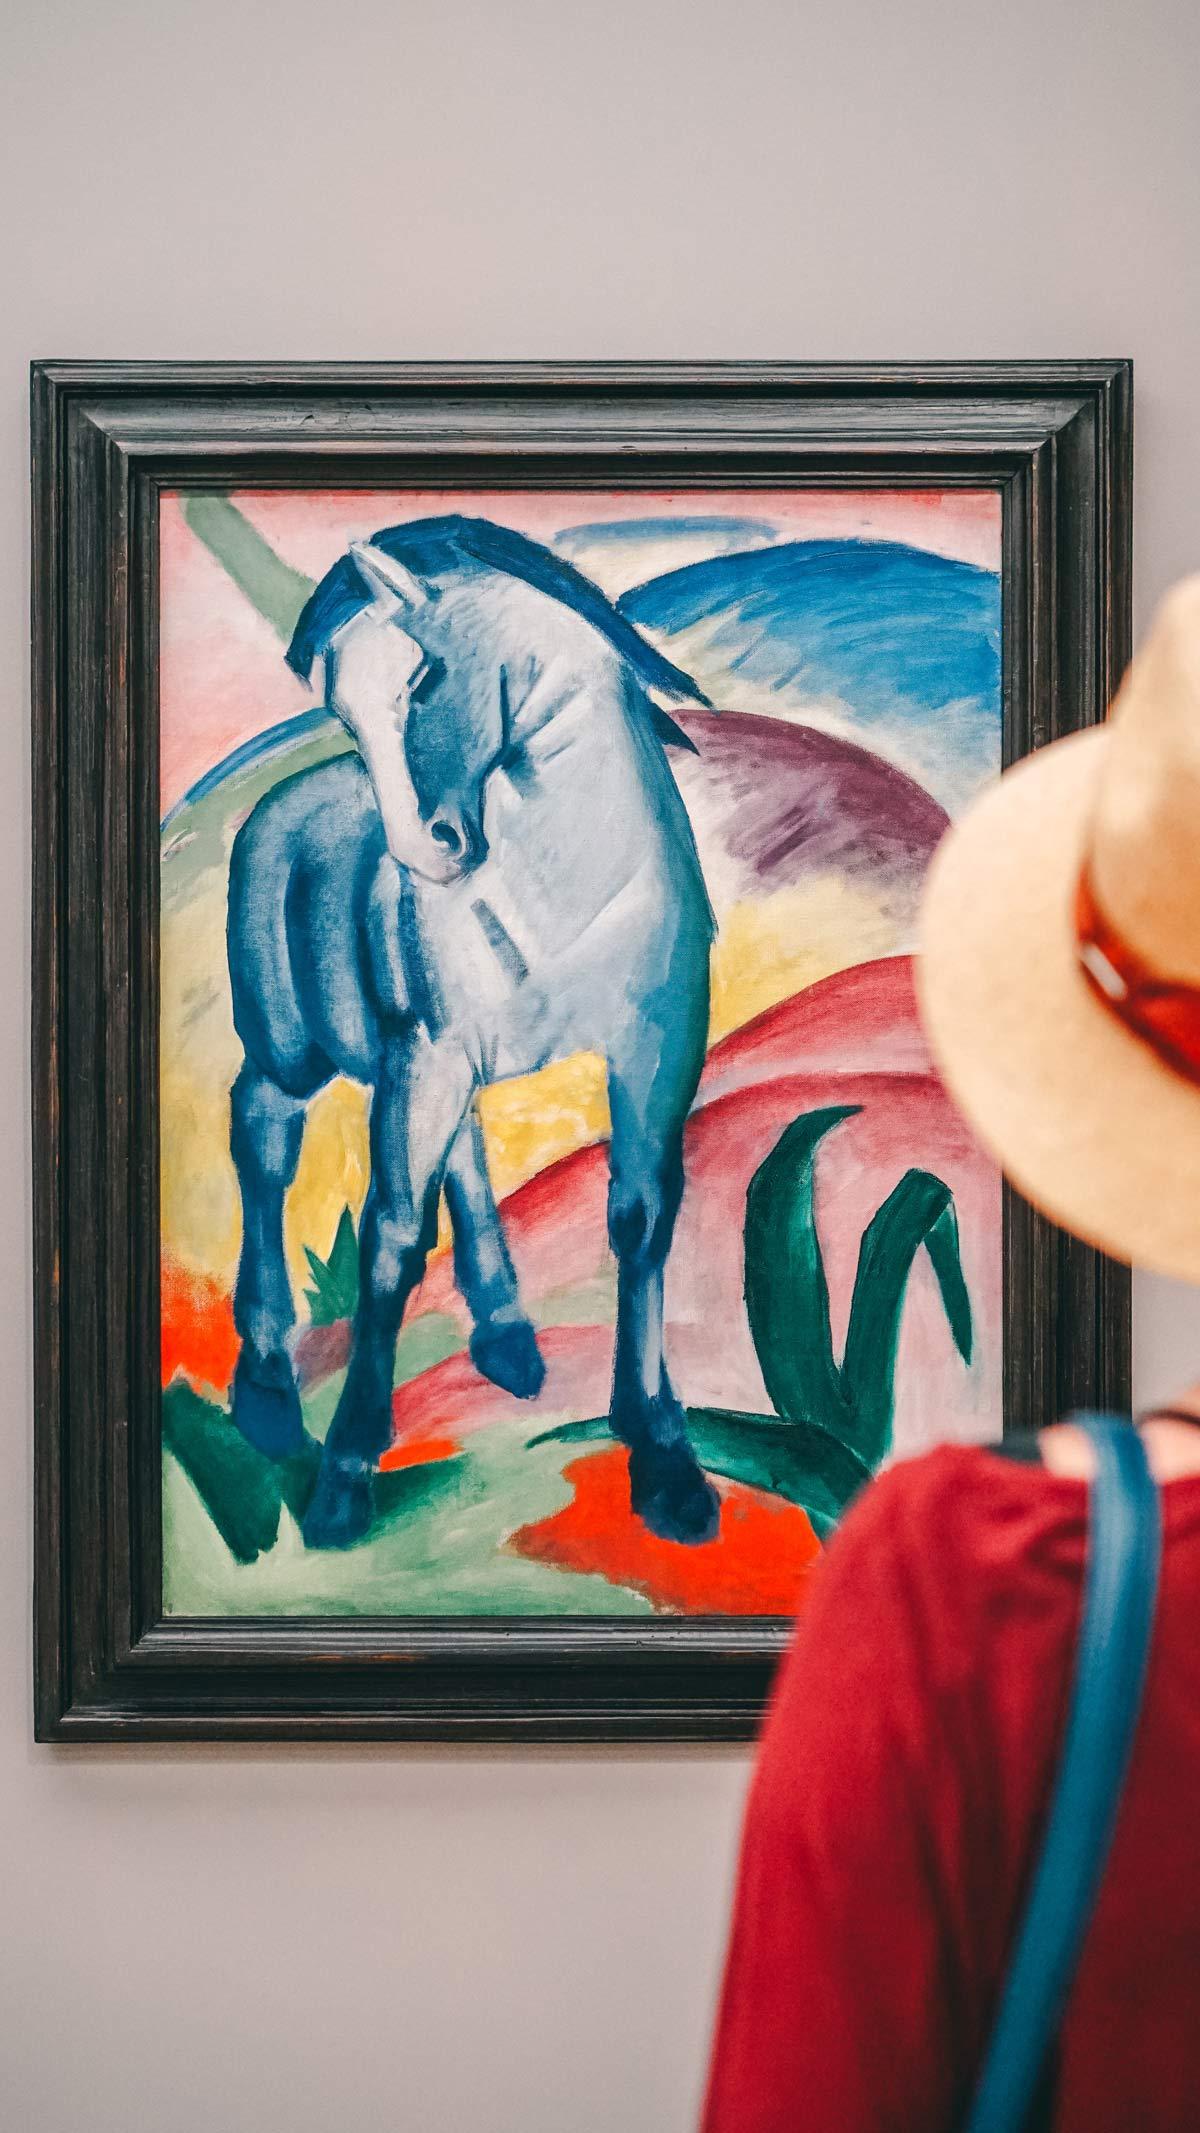 KunstKultur Lenbachhaus Das Blaue Pferd